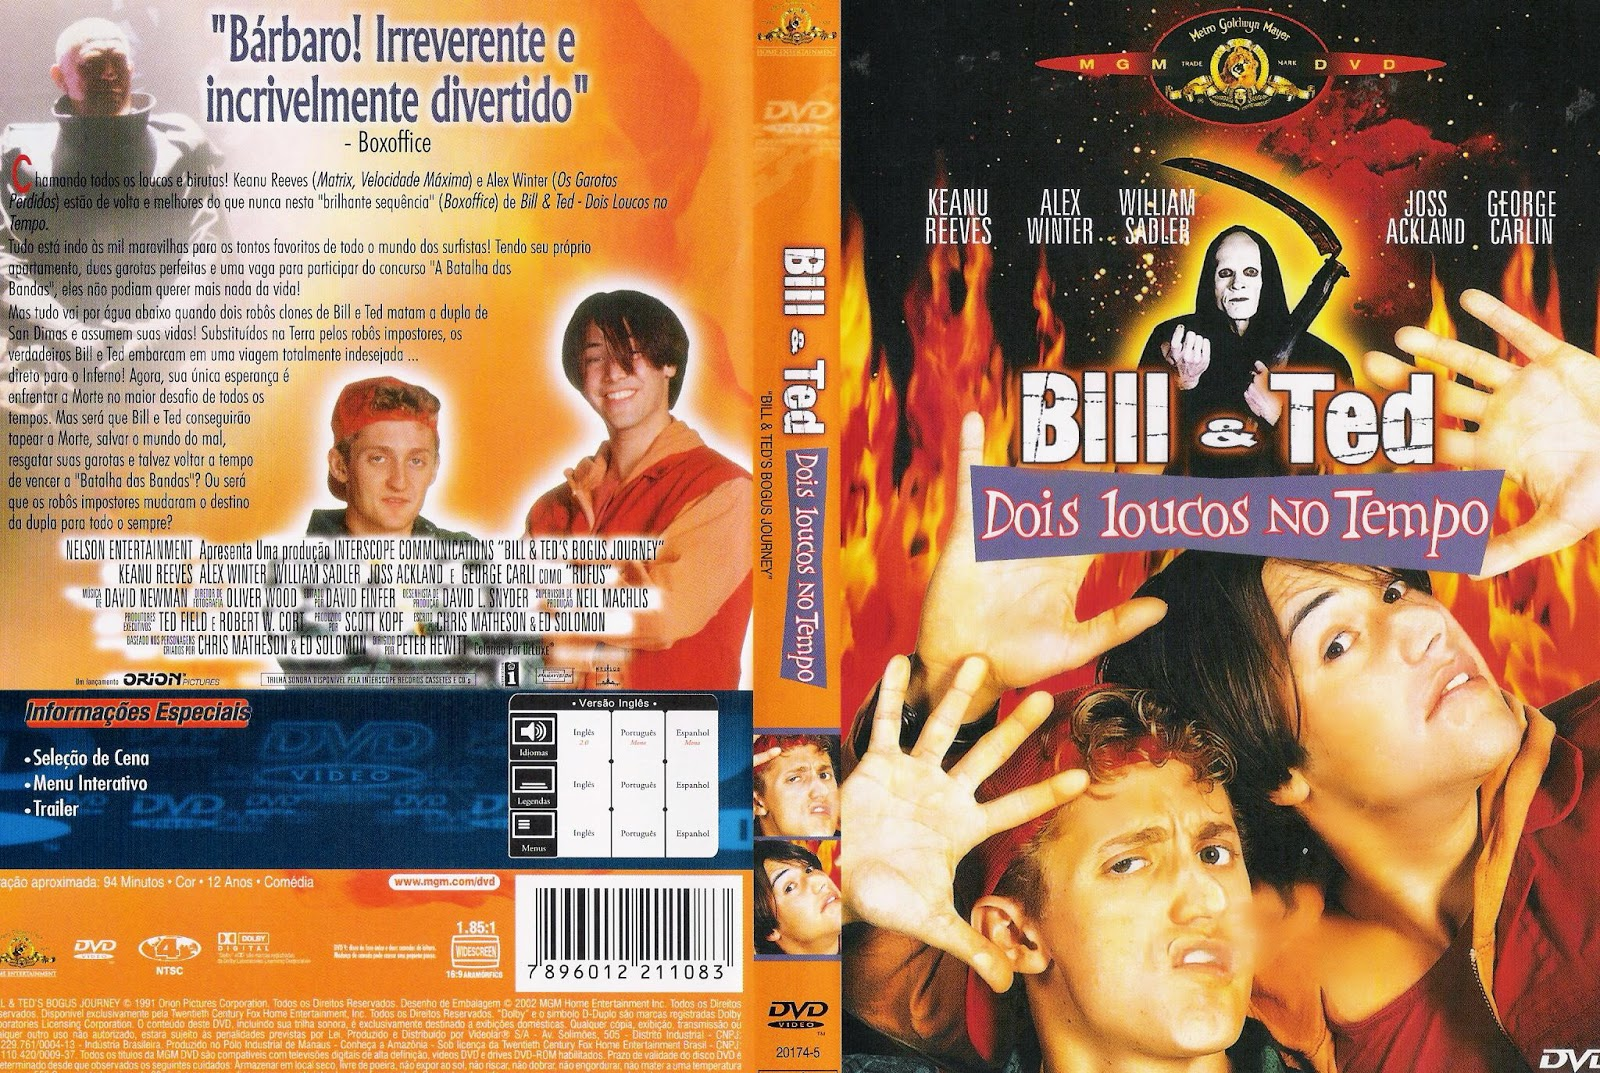 http://4.bp.blogspot.com/-Ii81iXscpAo/UQ1k0deTzTI/AAAAAAAAKiM/1taEbjQG6cI/s1600/Bill+e+Ted+Dois+Loucos+no+Tempo+DVD+Capa.jpg